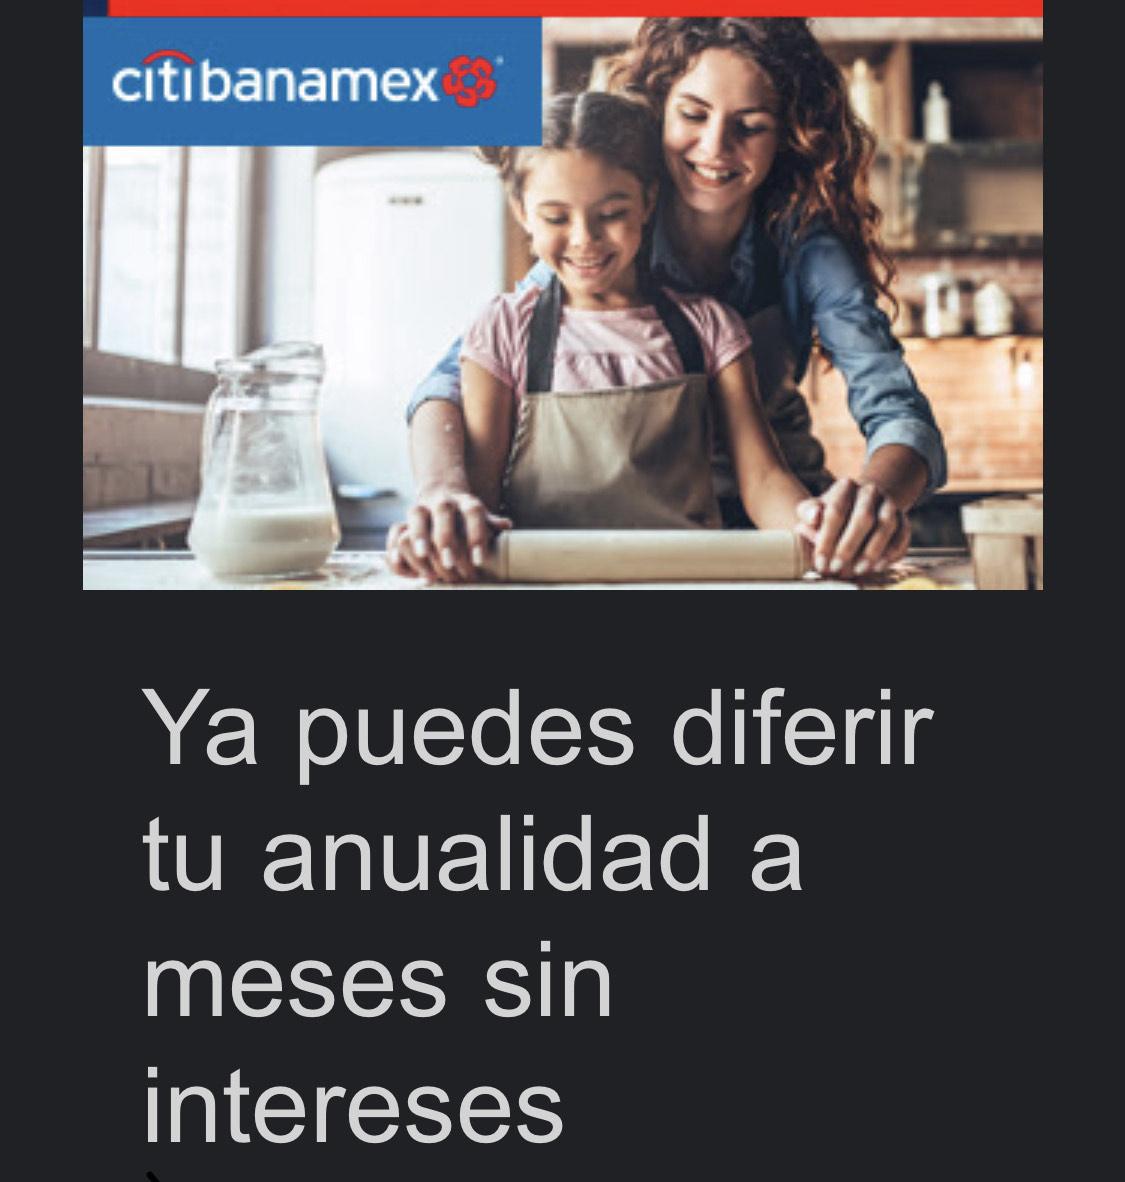 Citibanamex anualidad diferida